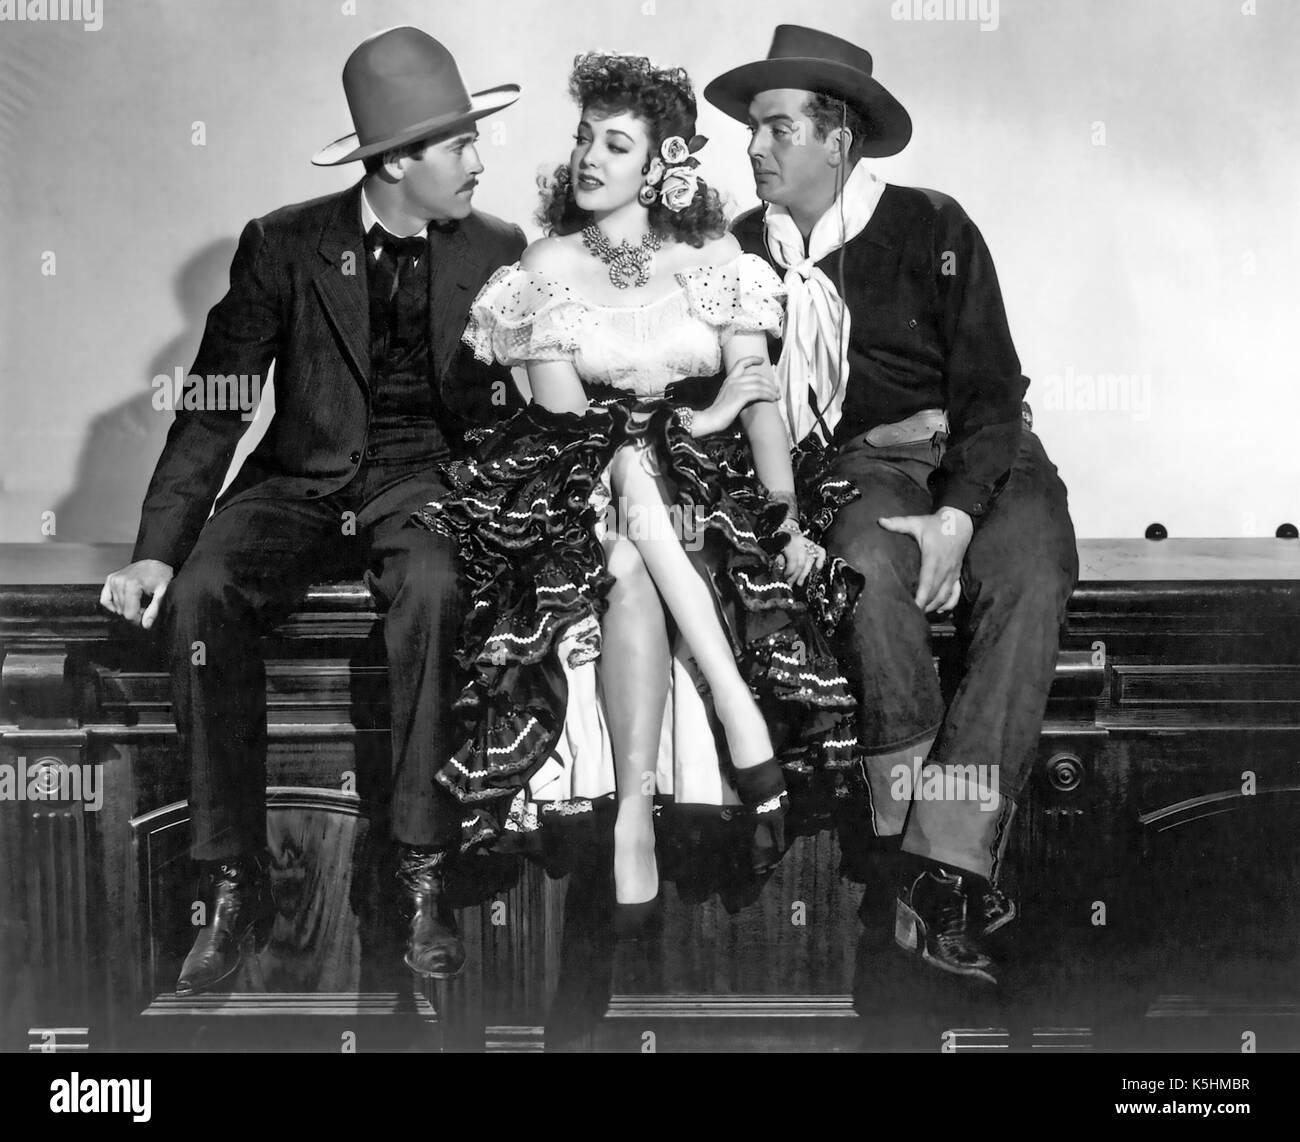 MY DARLING CLEMENTINE 1946 Twentieth Century Fox film with from left: Henry Fonda, Linda Darnell, Victor Mature - Stock Image